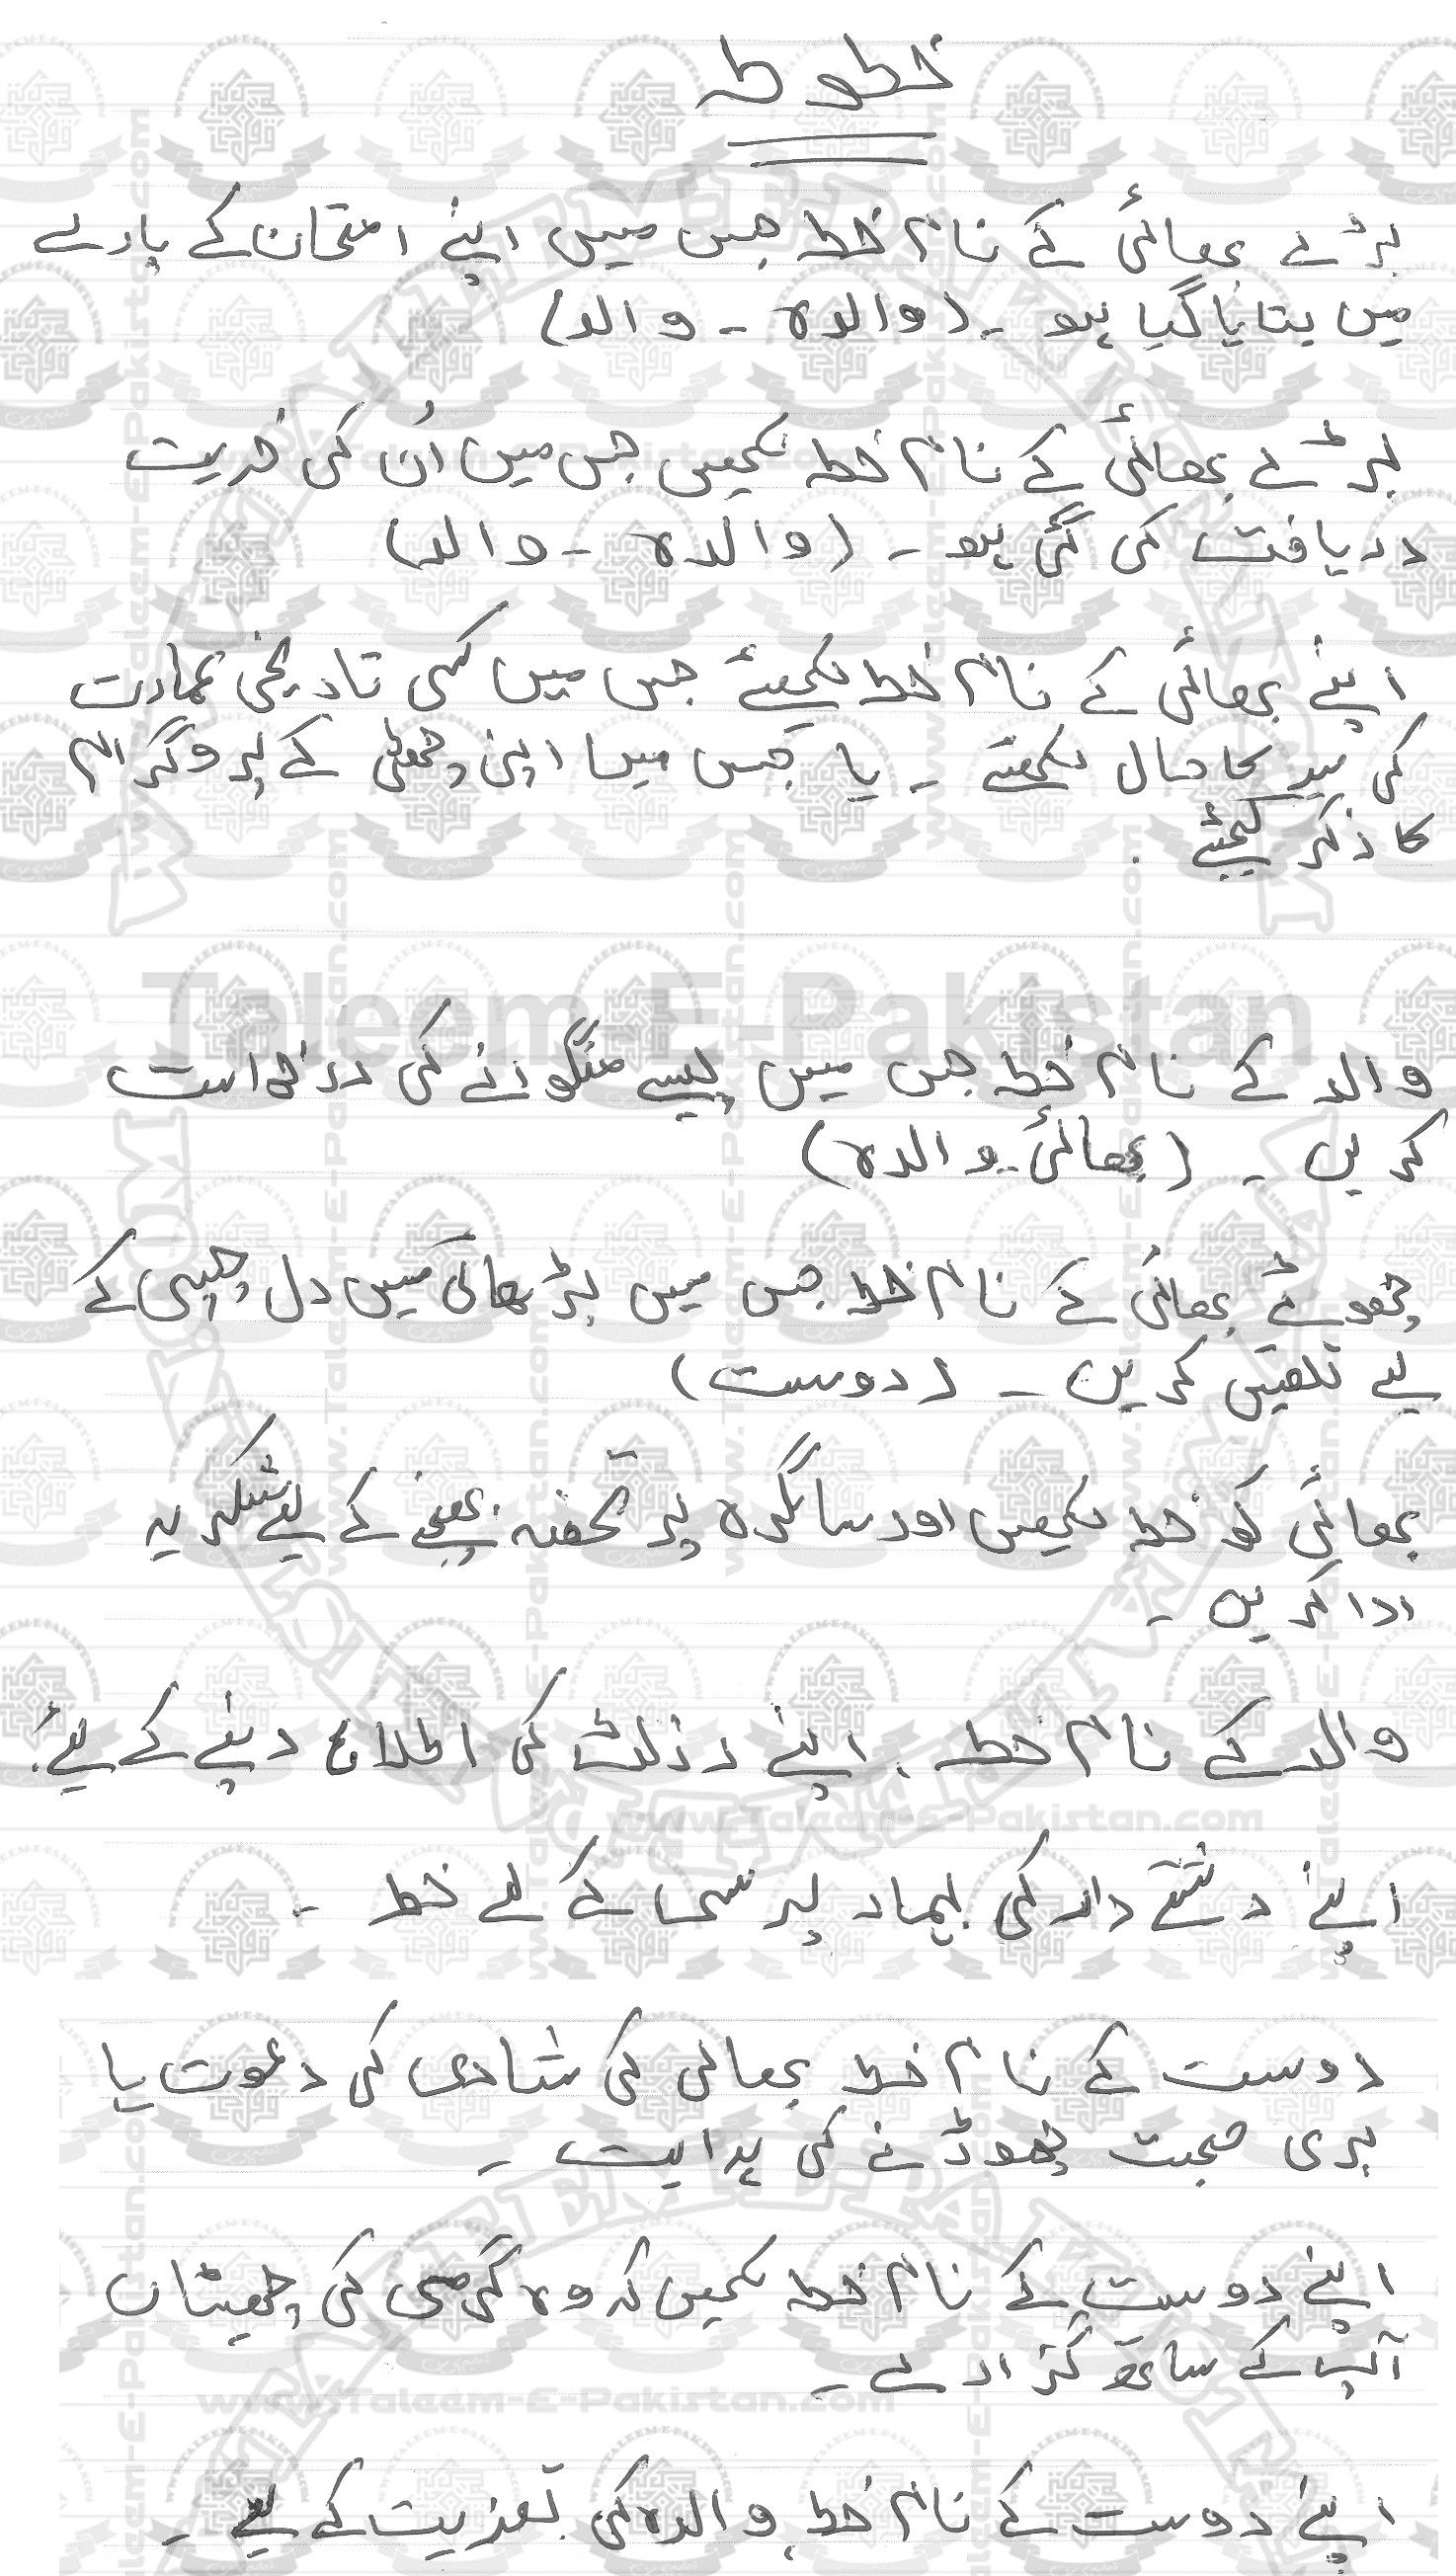 9th Class Urdu Compulsory Guess Paper 2017 Urdu Lettering Guess